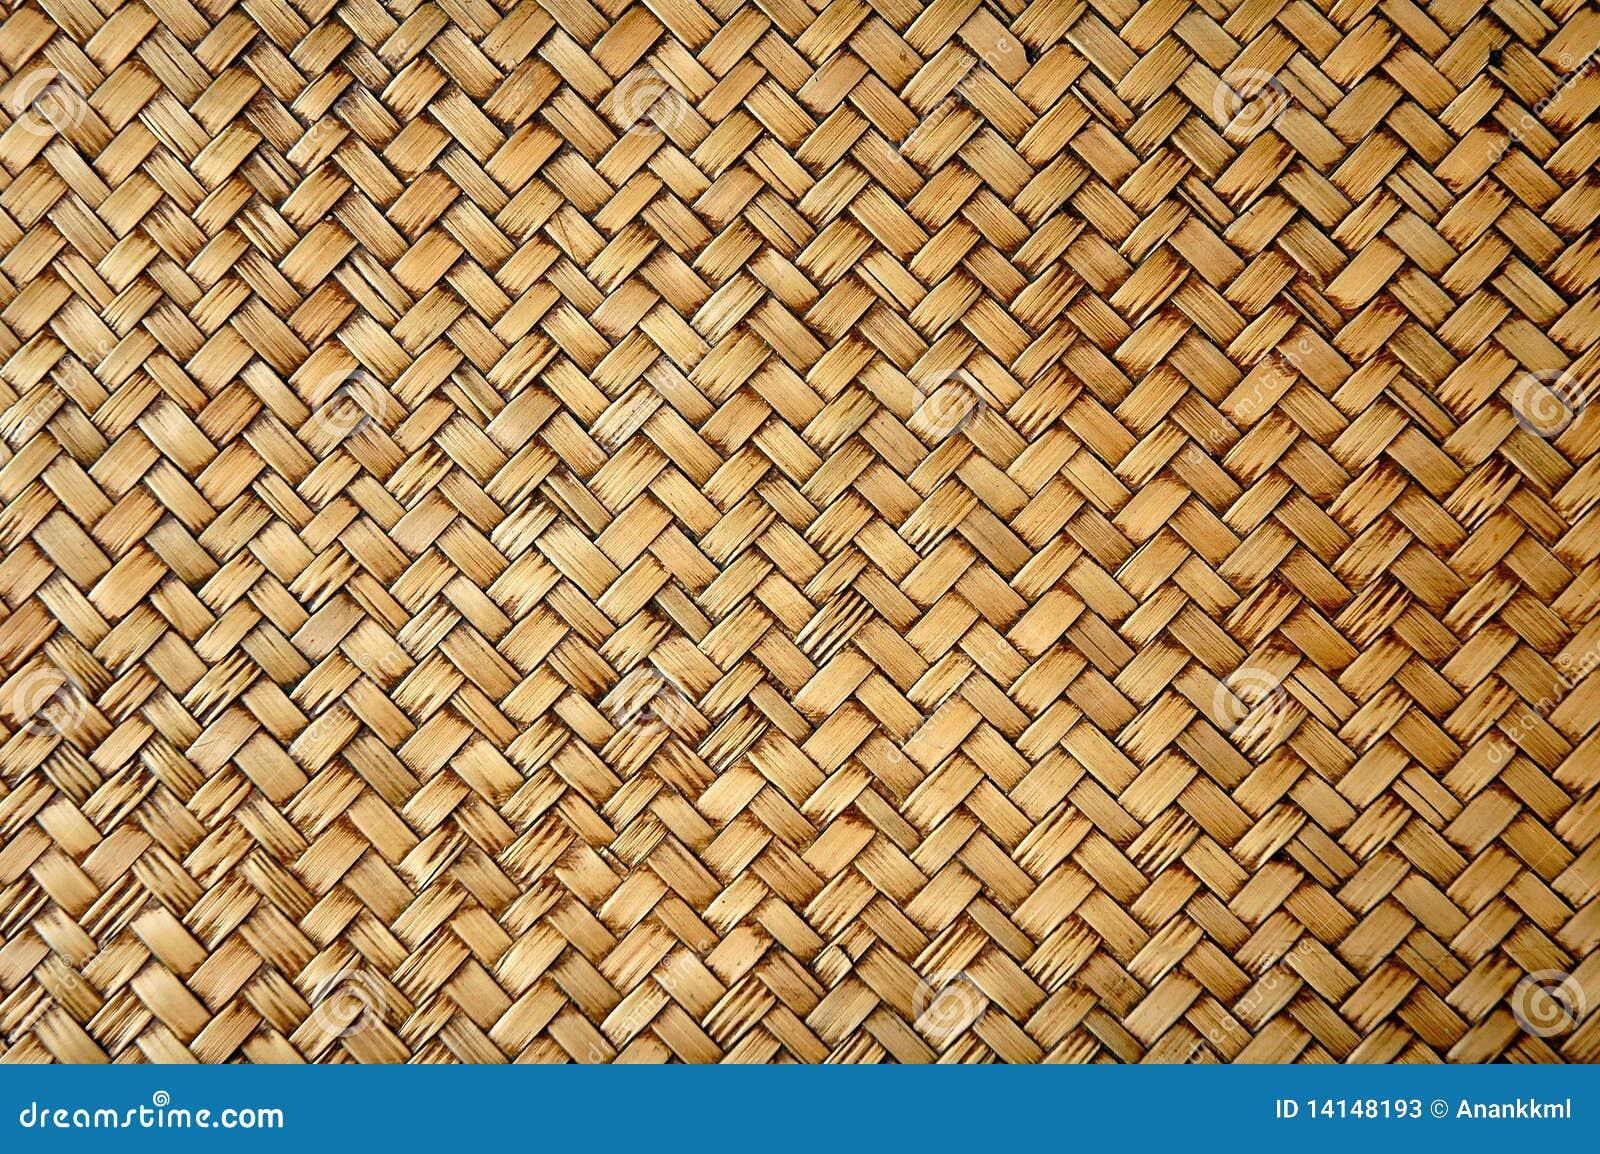 Muebles de bamb - Muebles de tailandia ...